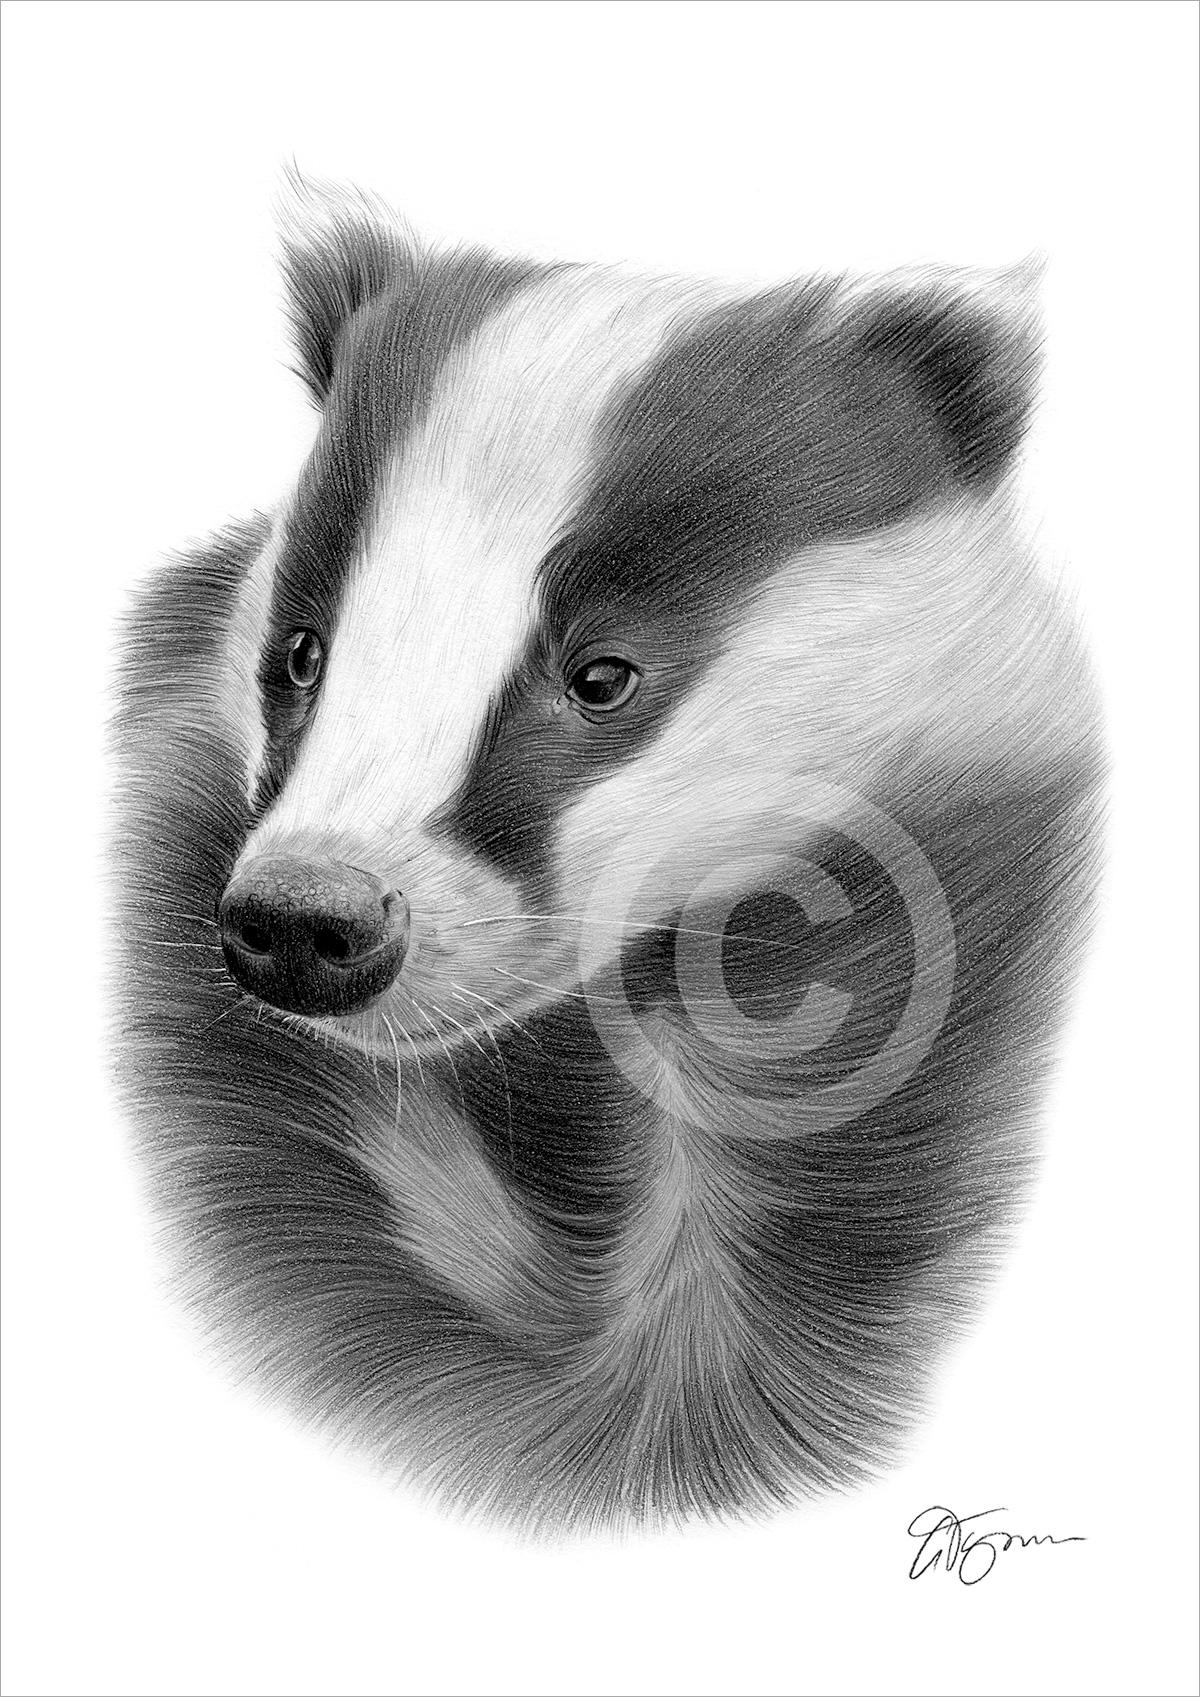 Uncategorized Badger Drawing pencil drawing of a european badger by artist gary tymon tymon